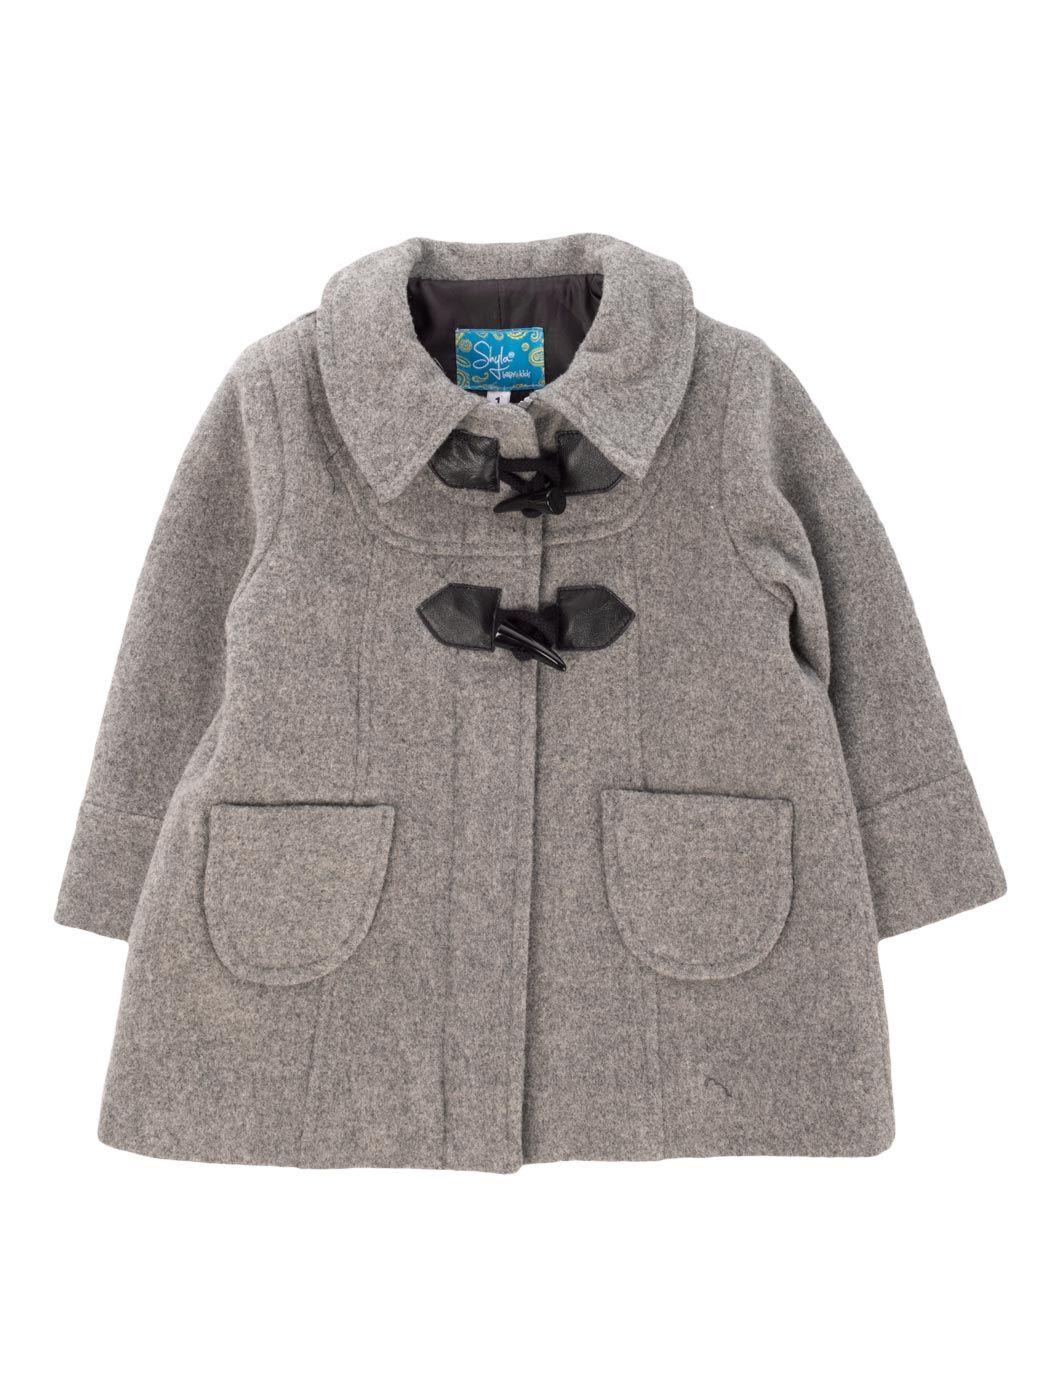 Abrigos nina color gris